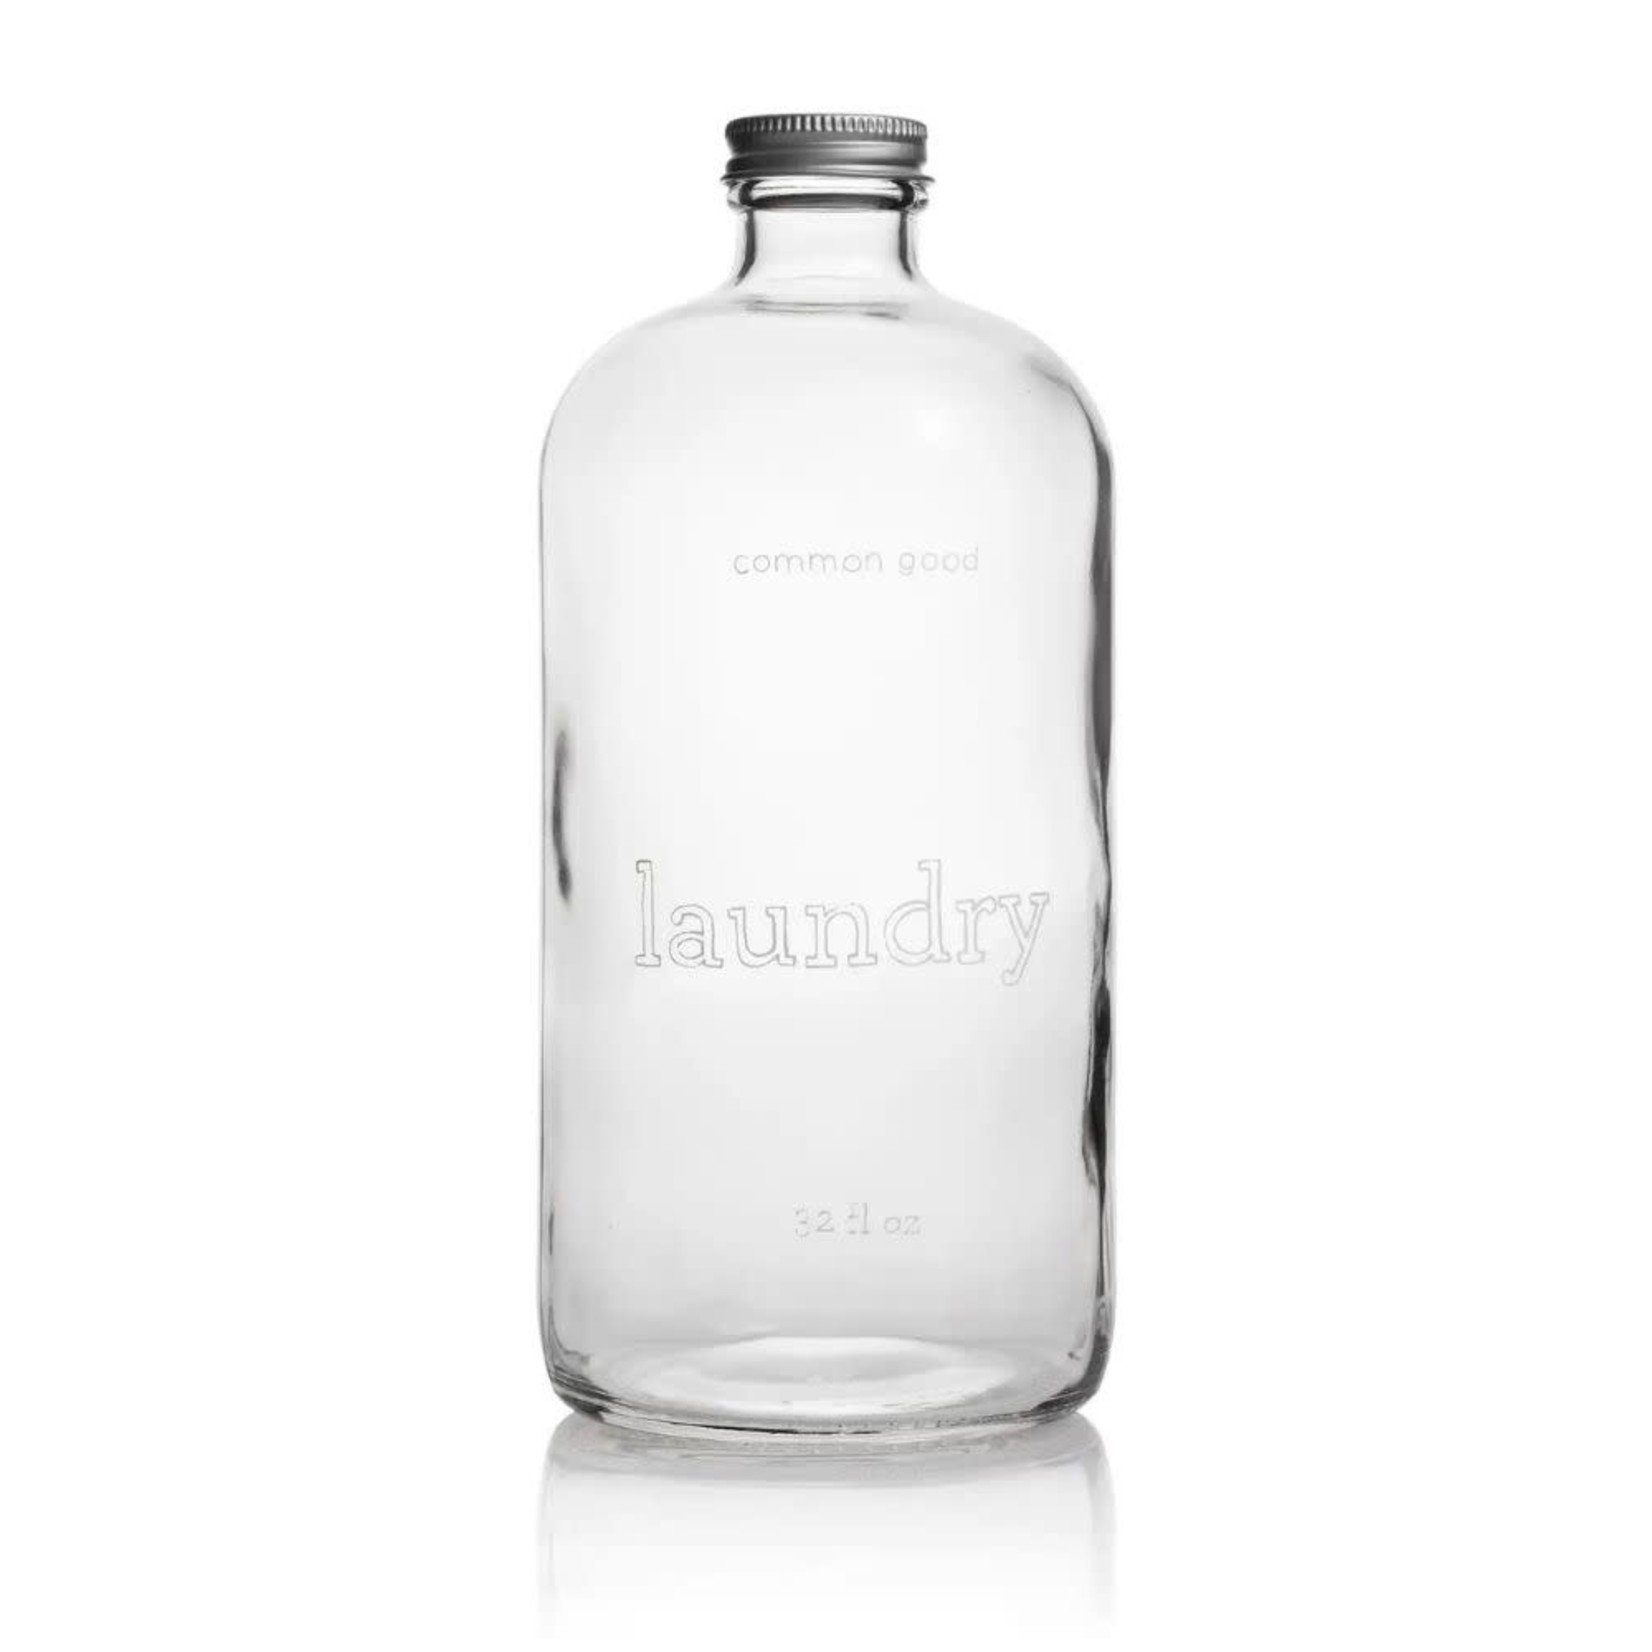 32oz Glass Bottle, Laundry